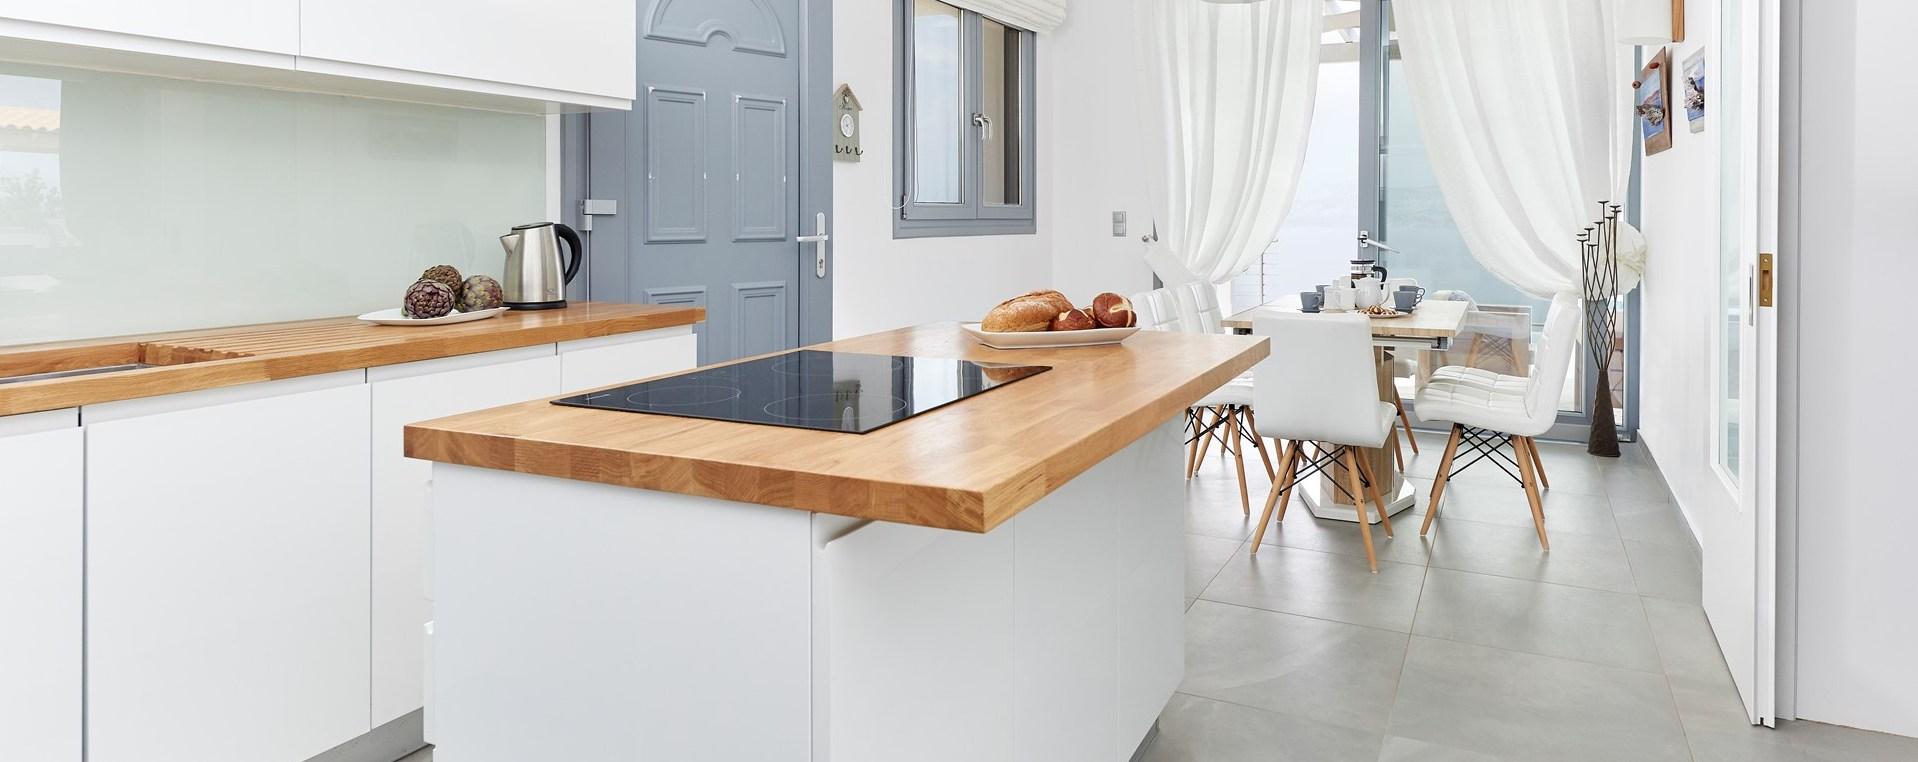 villa-kitchen-corfu